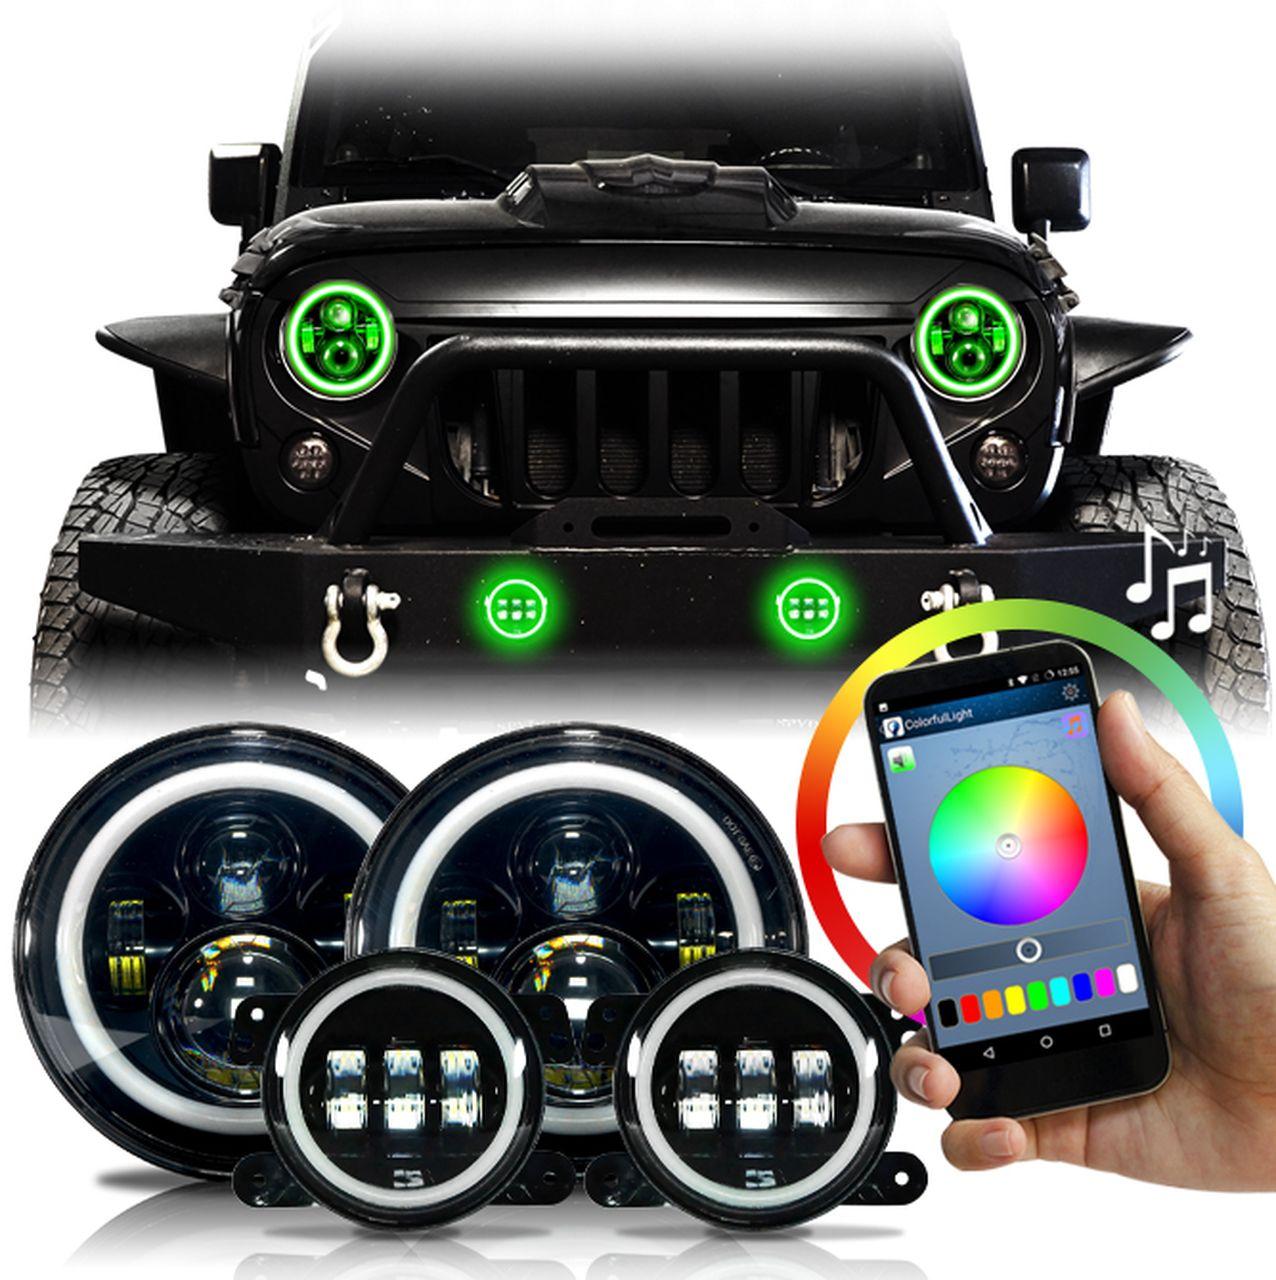 HALO RGB Color Projector LED Headlights & Fog Lights Kit